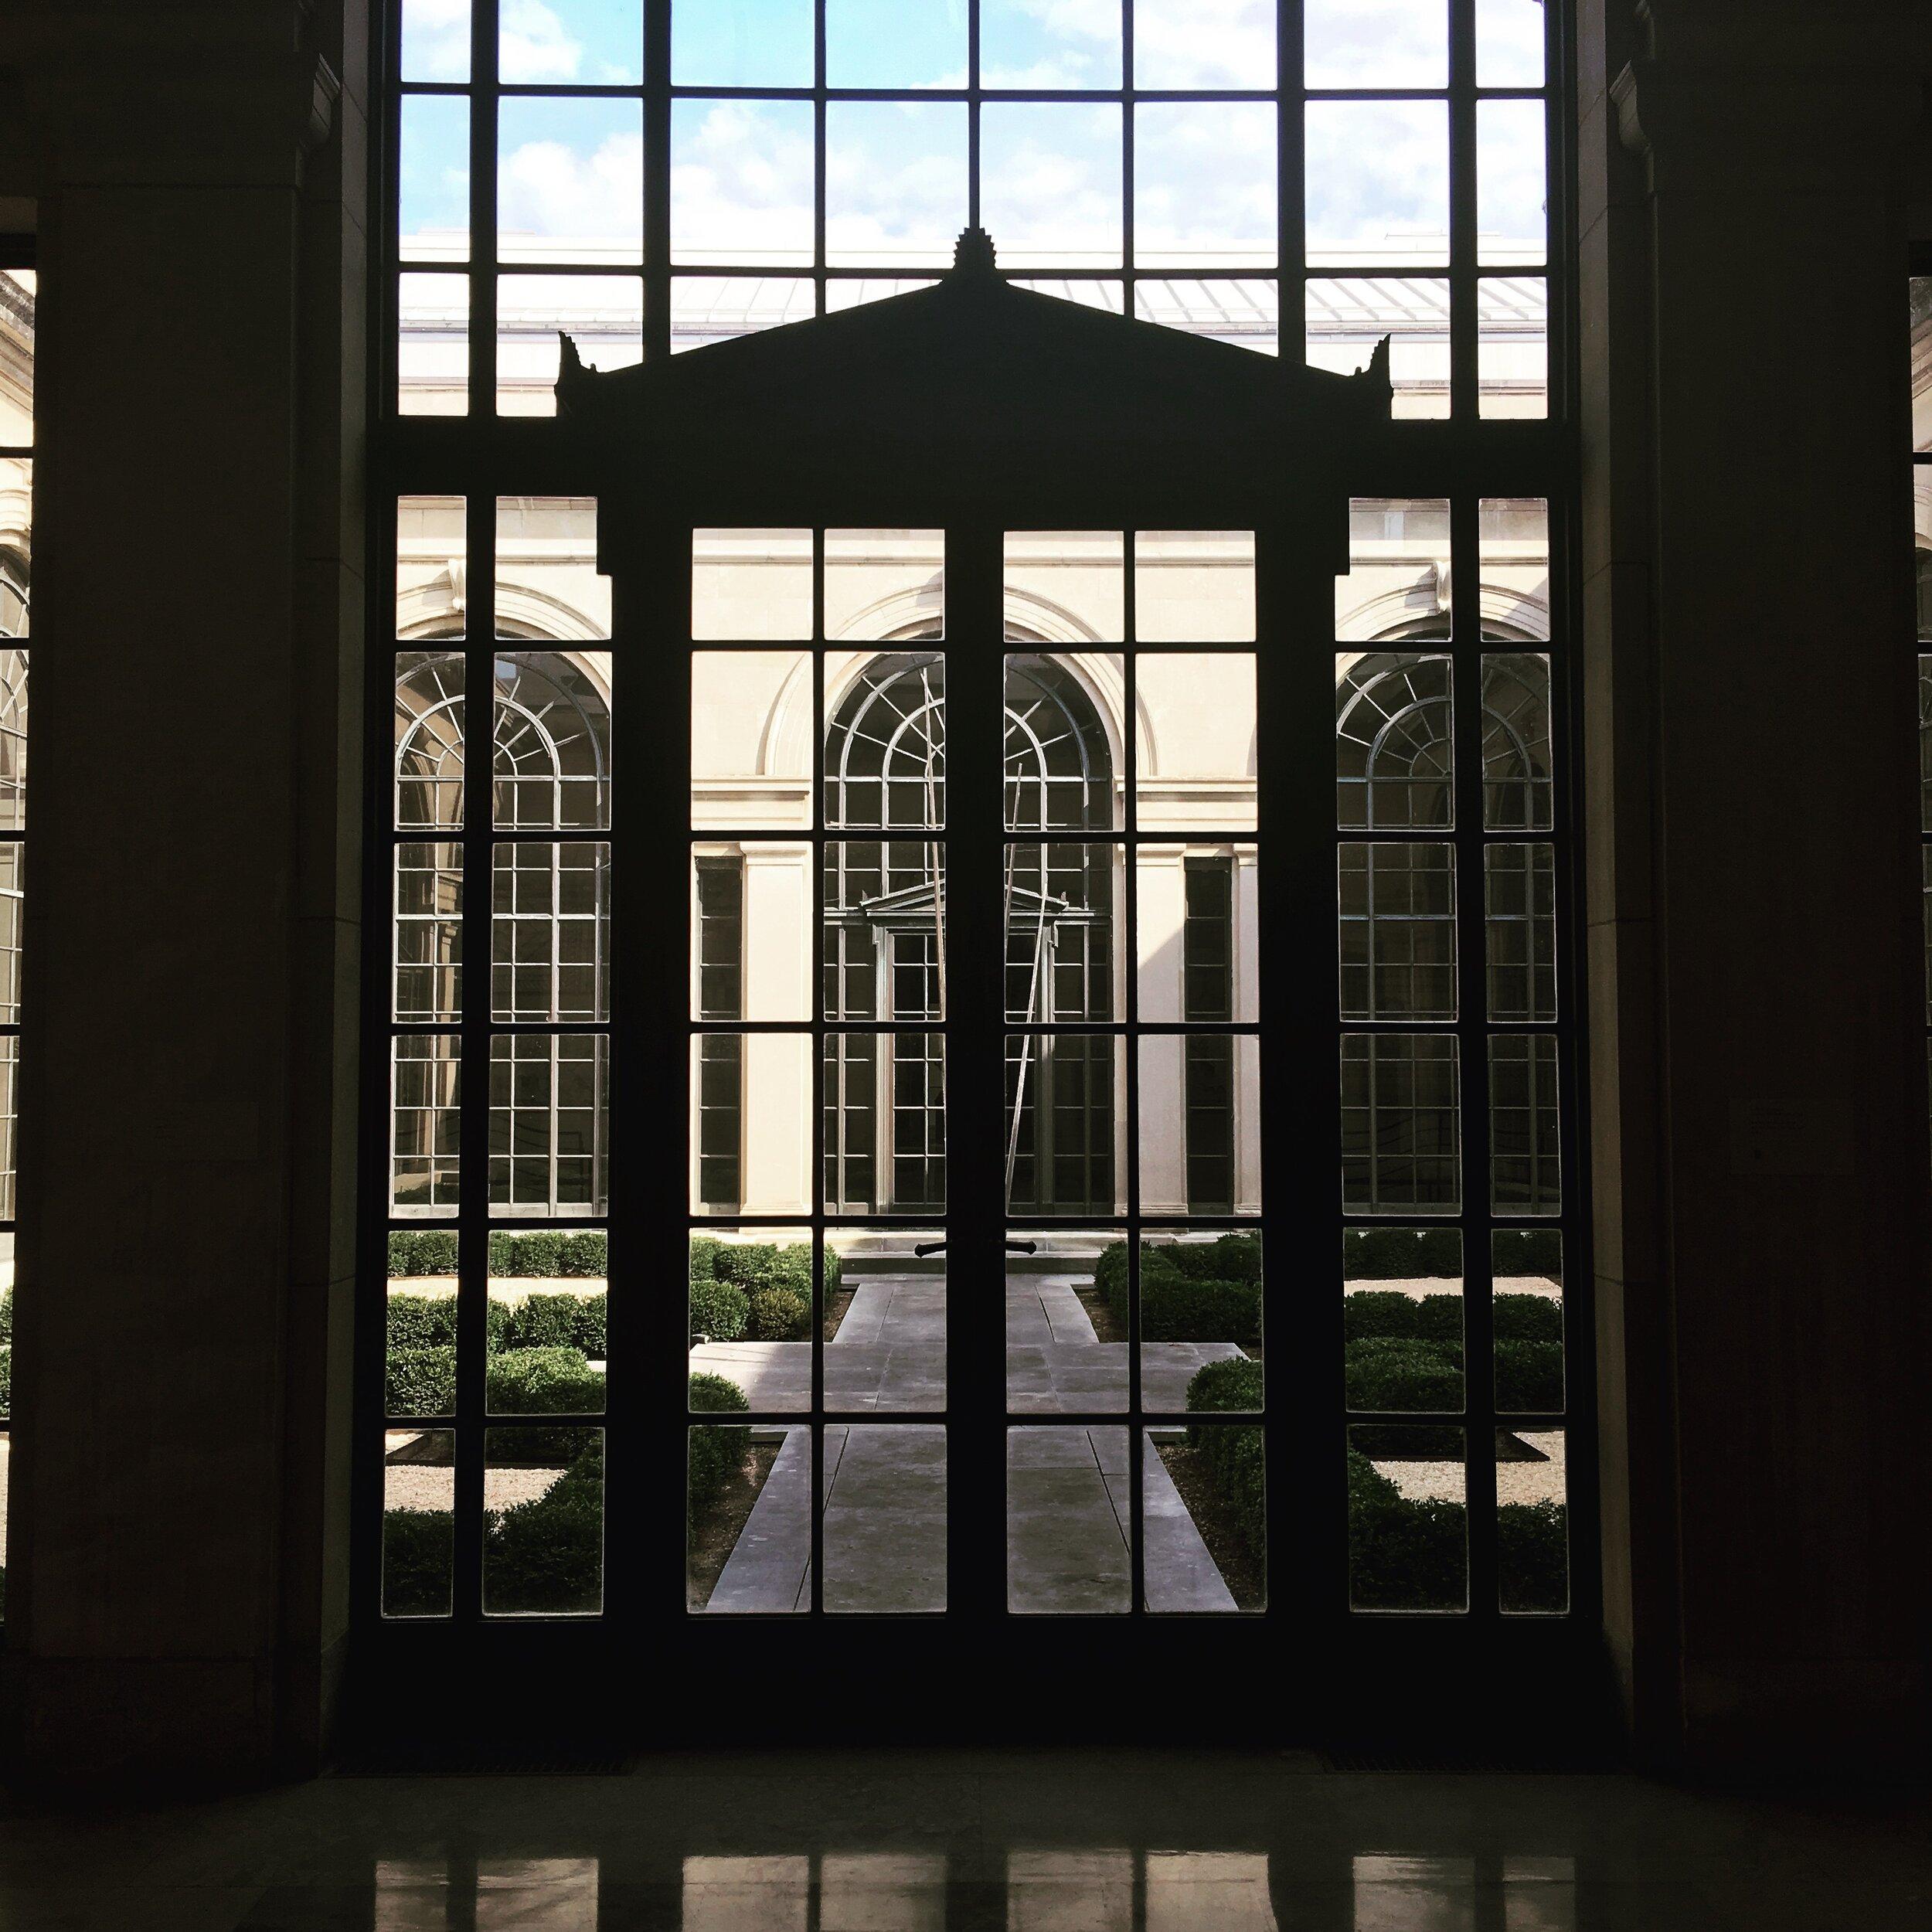 Baltimore Museum of Art at the Johns Hopkins University Homewood Campus (D. Draudt, October 2016)